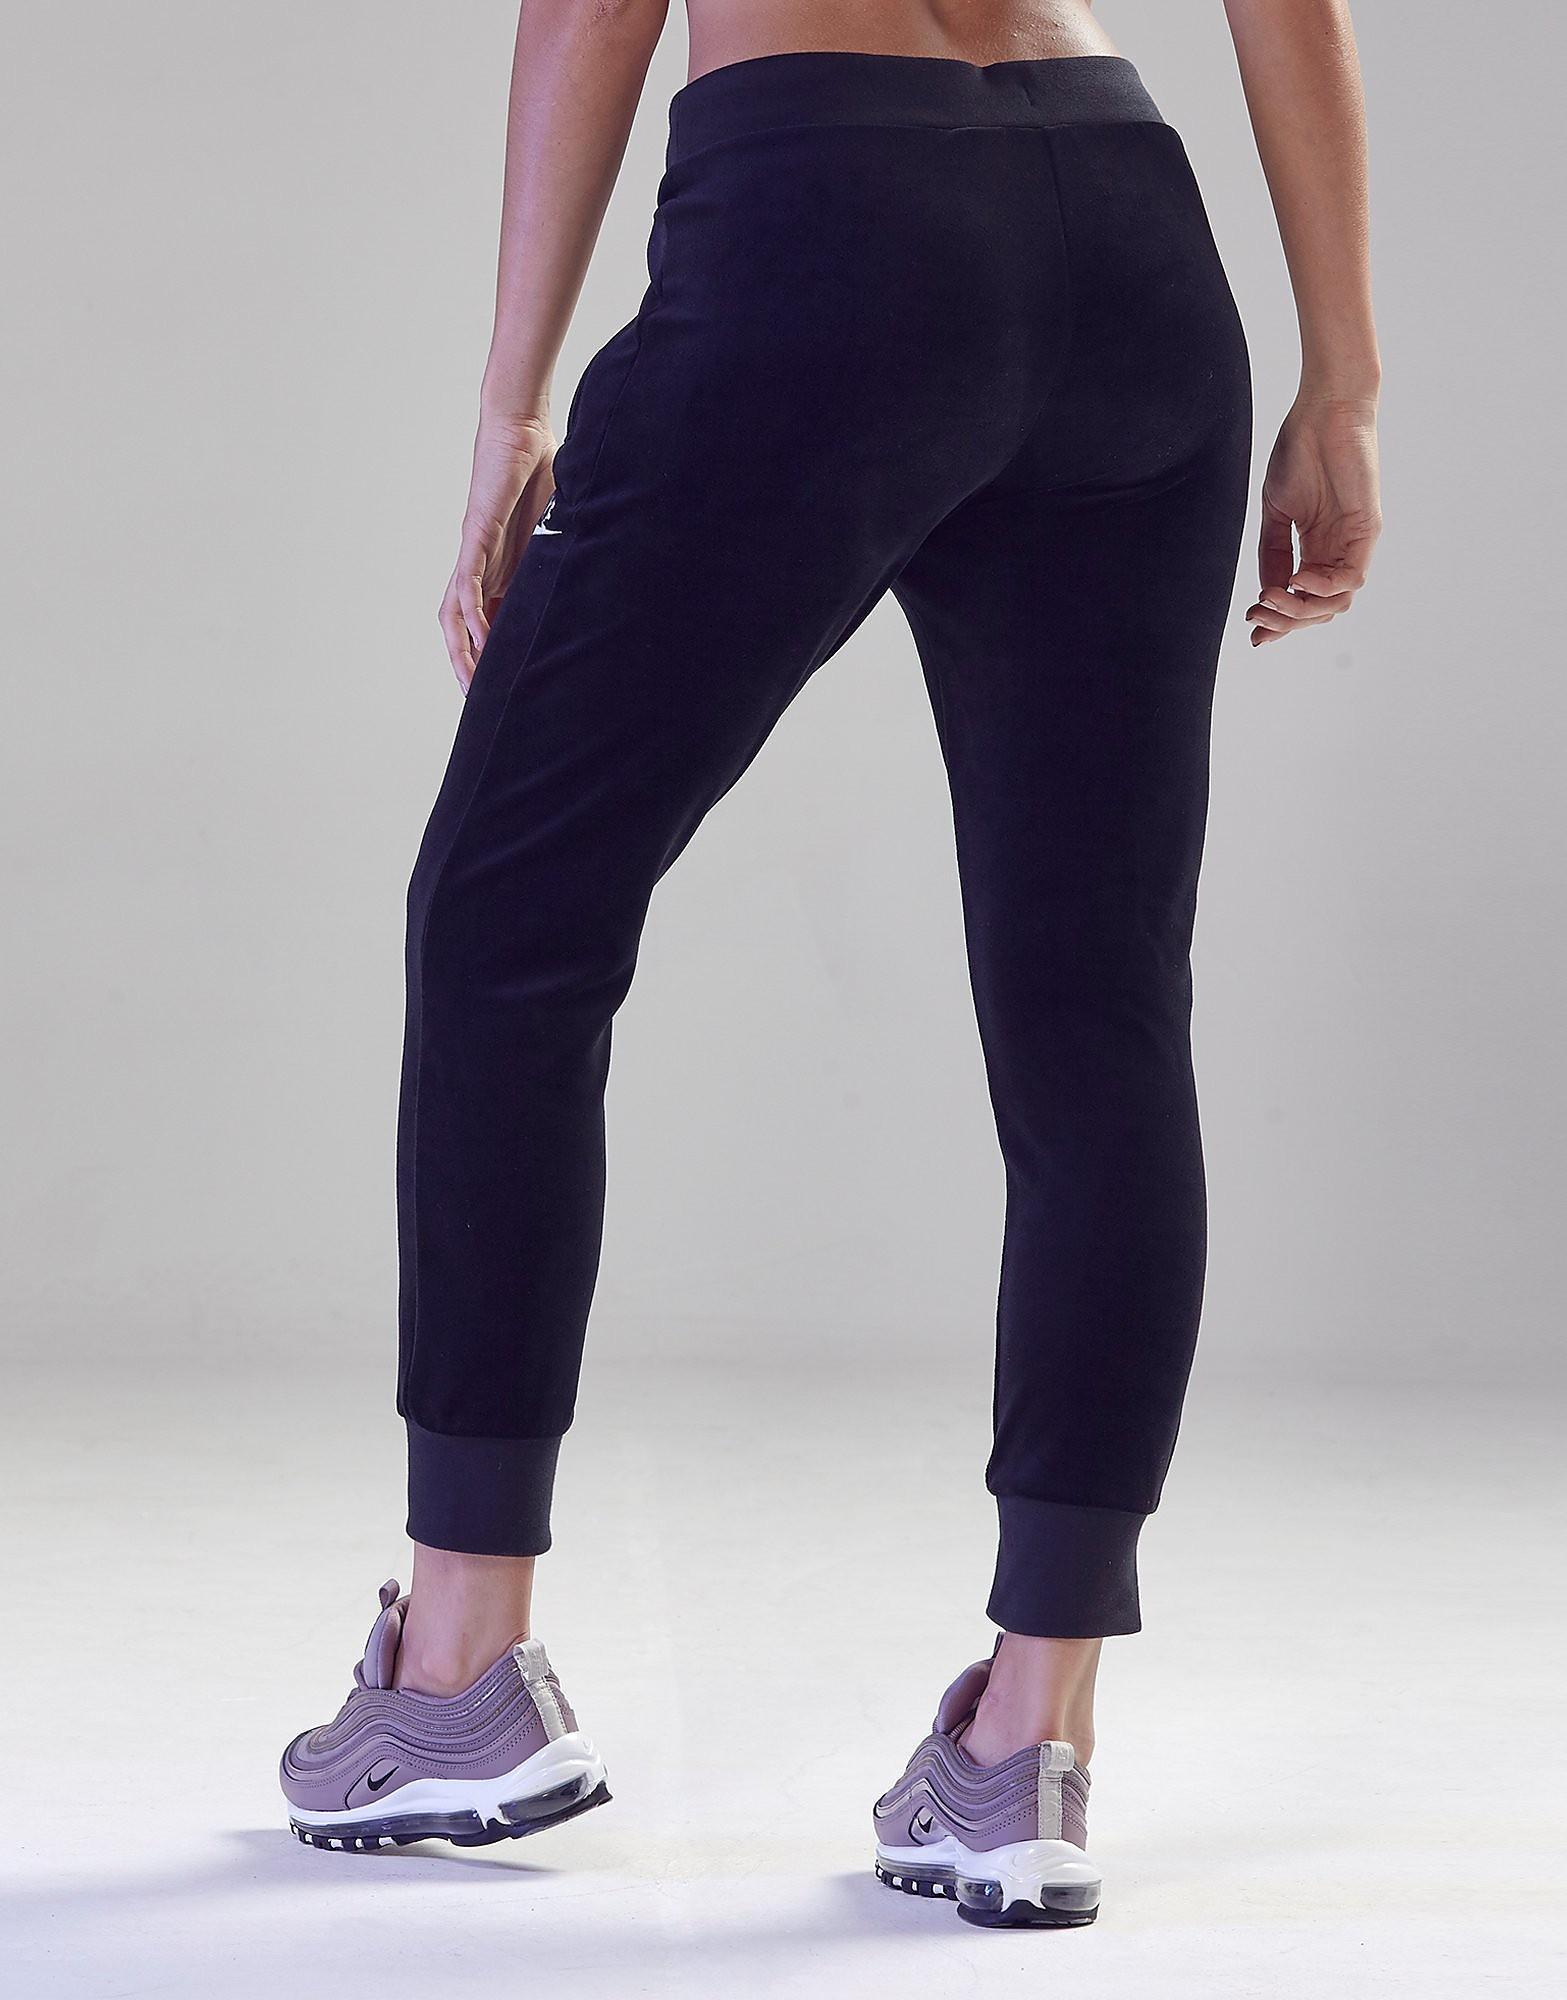 Nike pantalón de chándal Velour